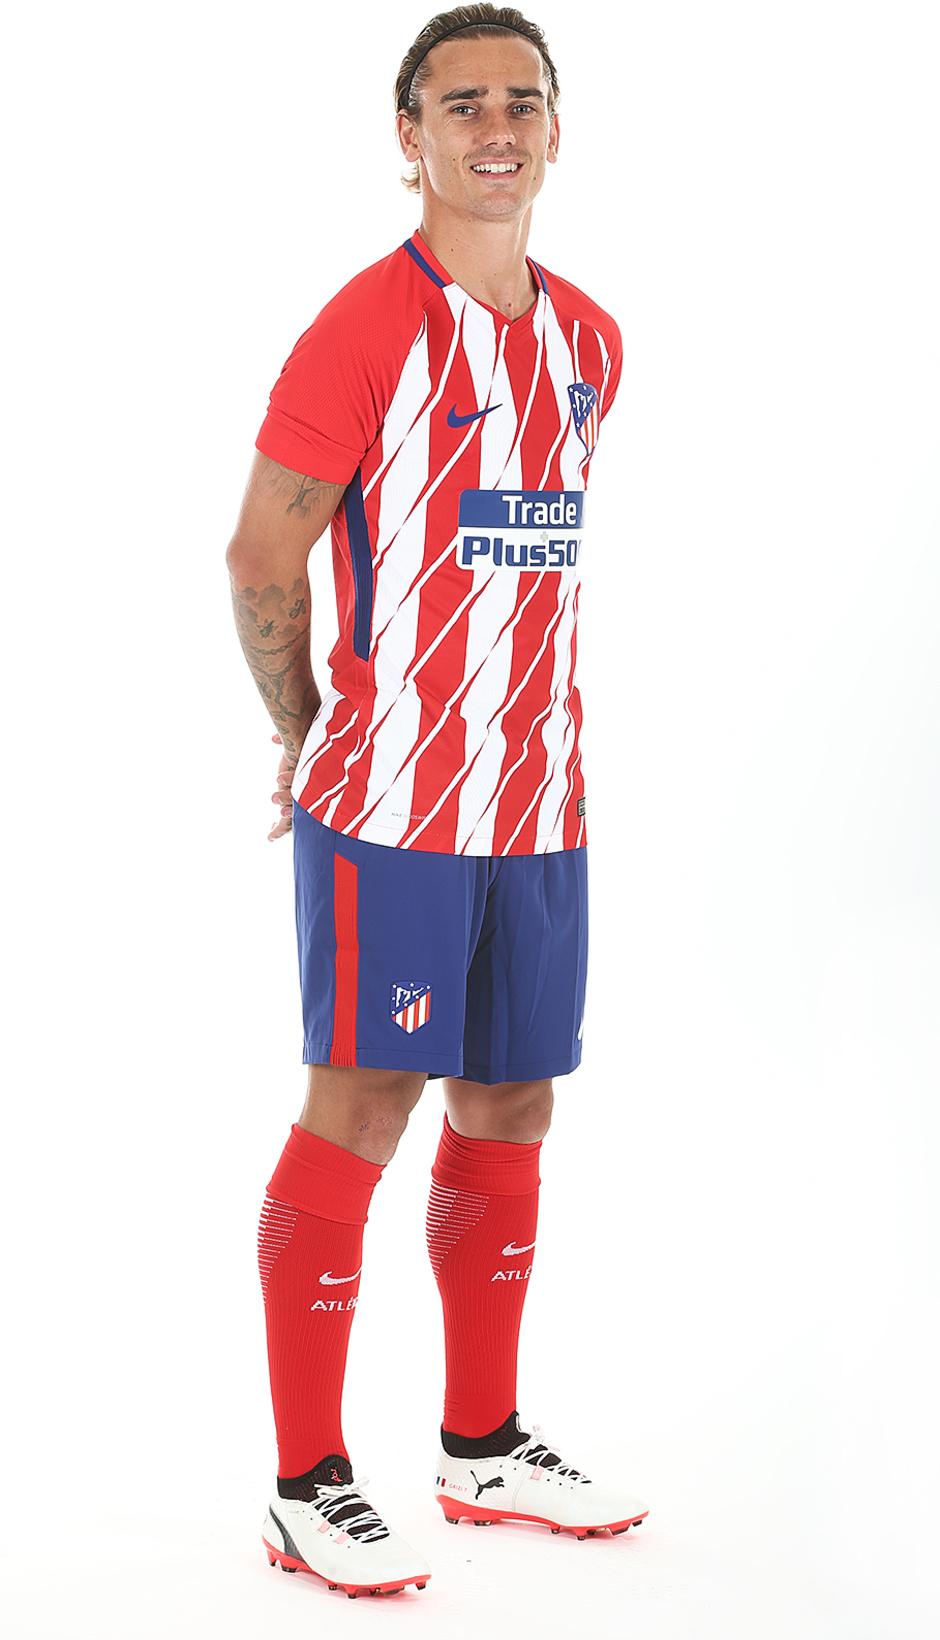 Club Atletico De Madrid Atletico De Madrid S New Kits For The 2017